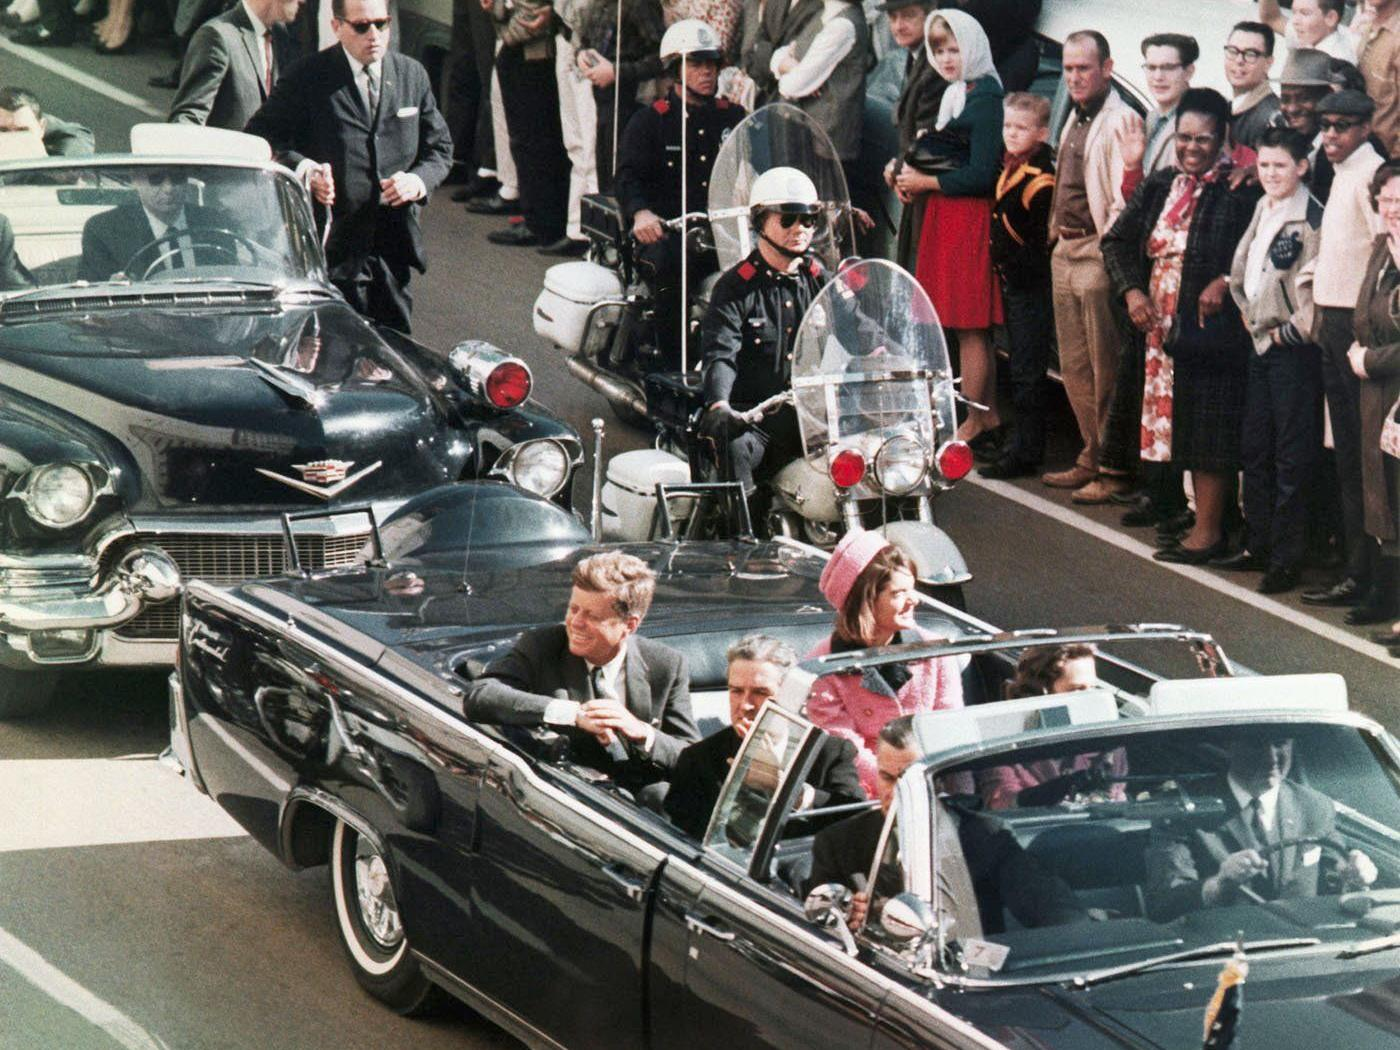 Der Tag, an dem die USA still stand: Am 22. November 1963 wurde John F. Kennedy ermordet.